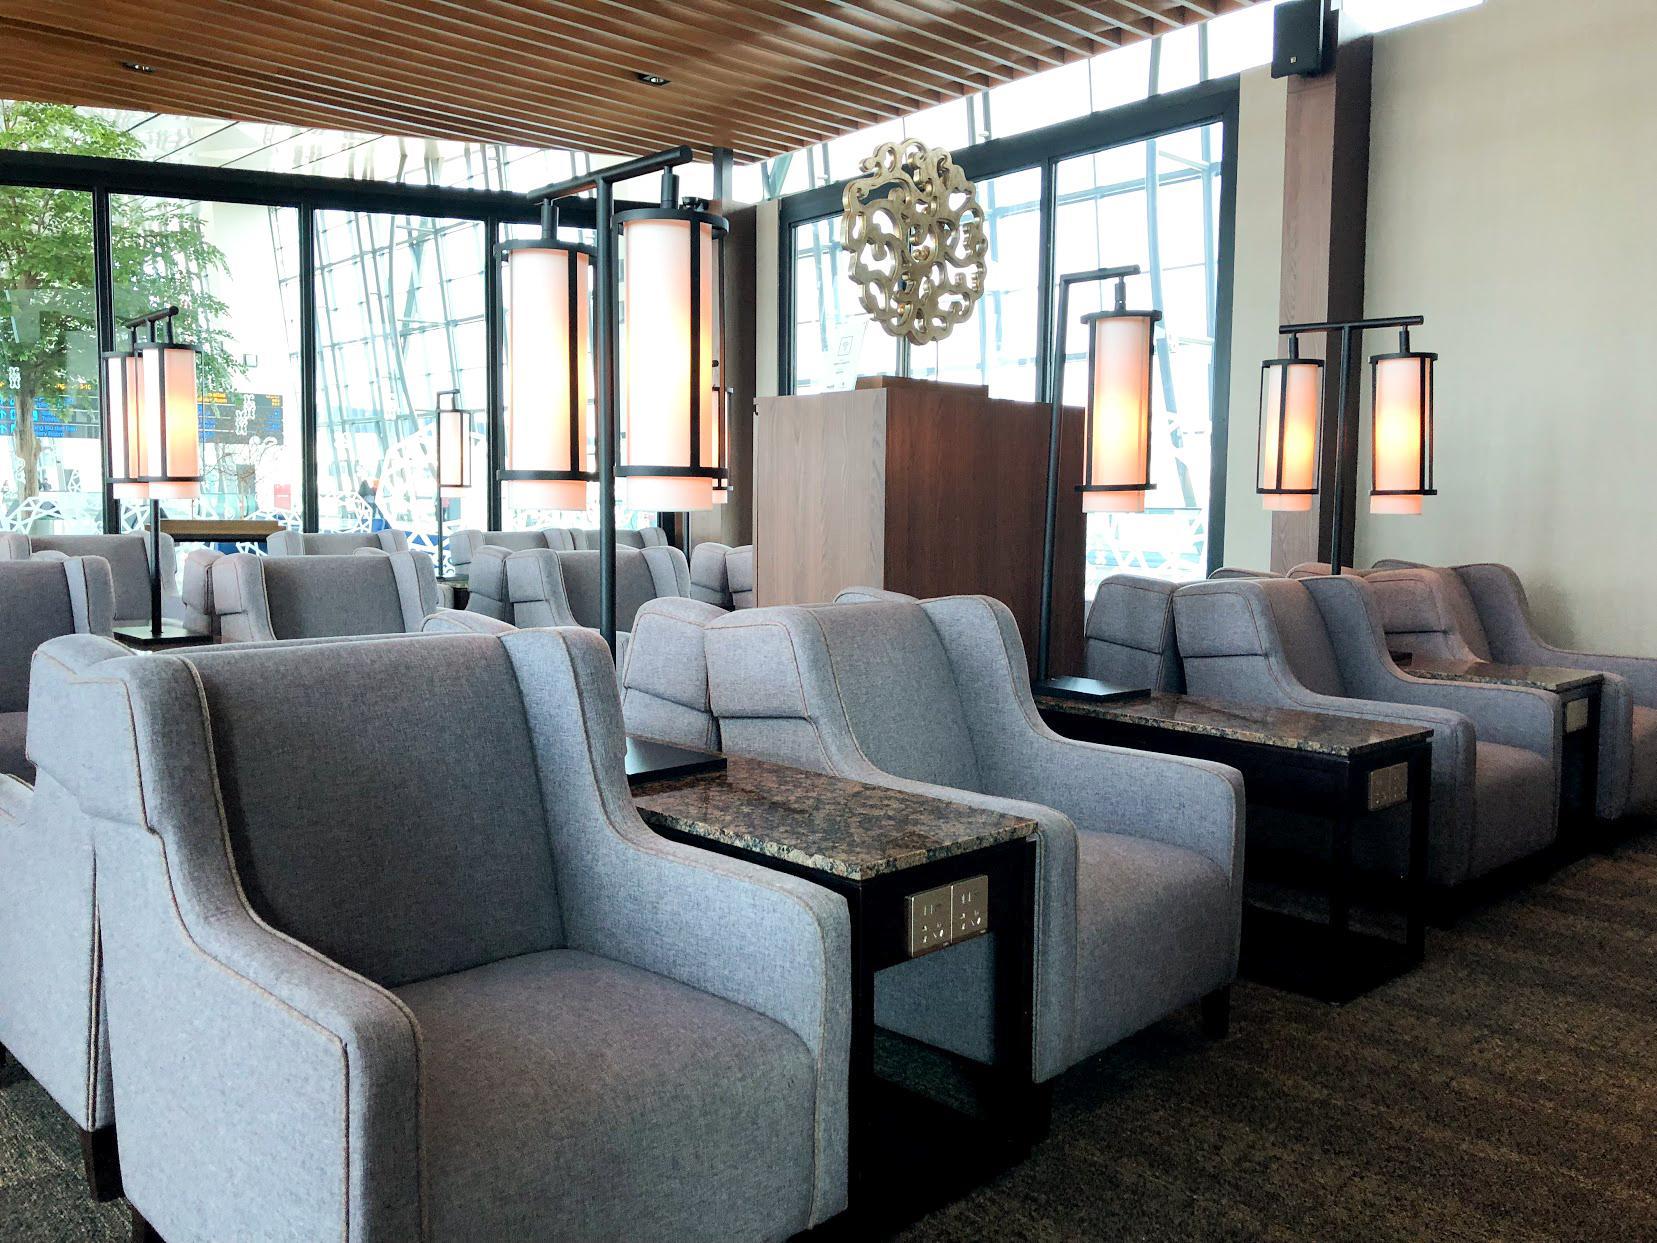 Plaza Premium Saphire Lounge Jakarta seating area